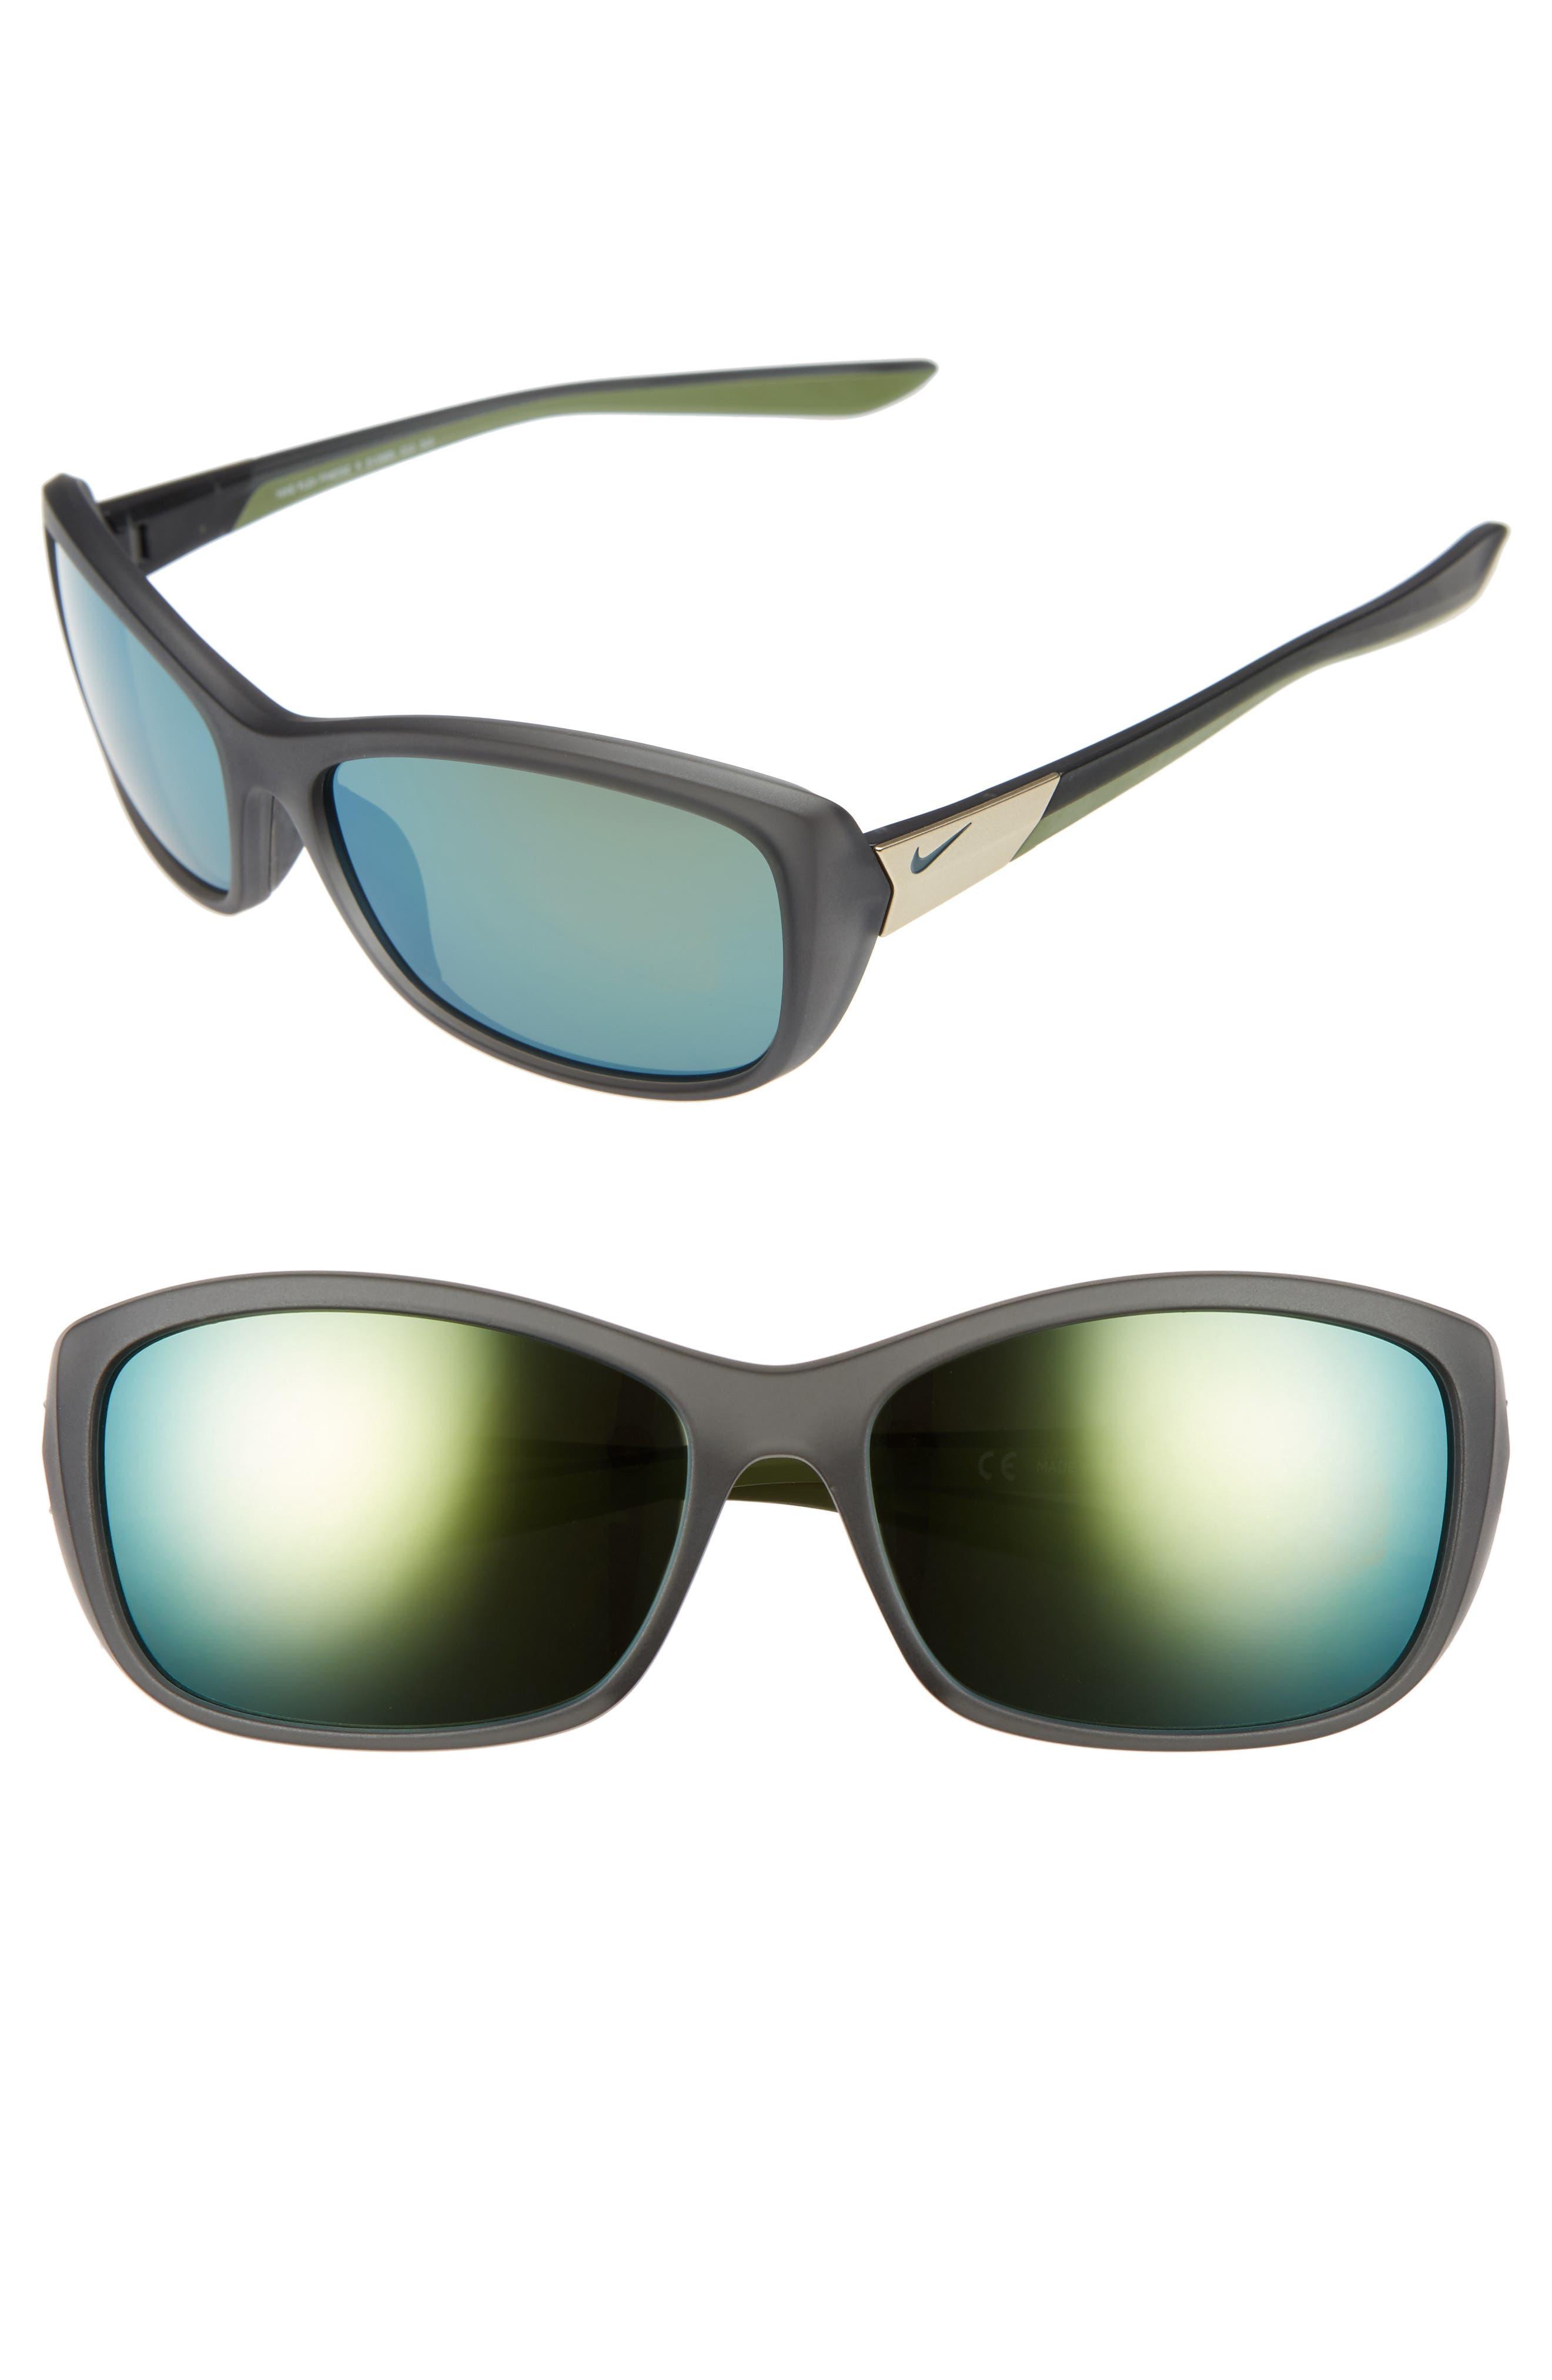 Nike Flex Finesse 58mm Sunglasses